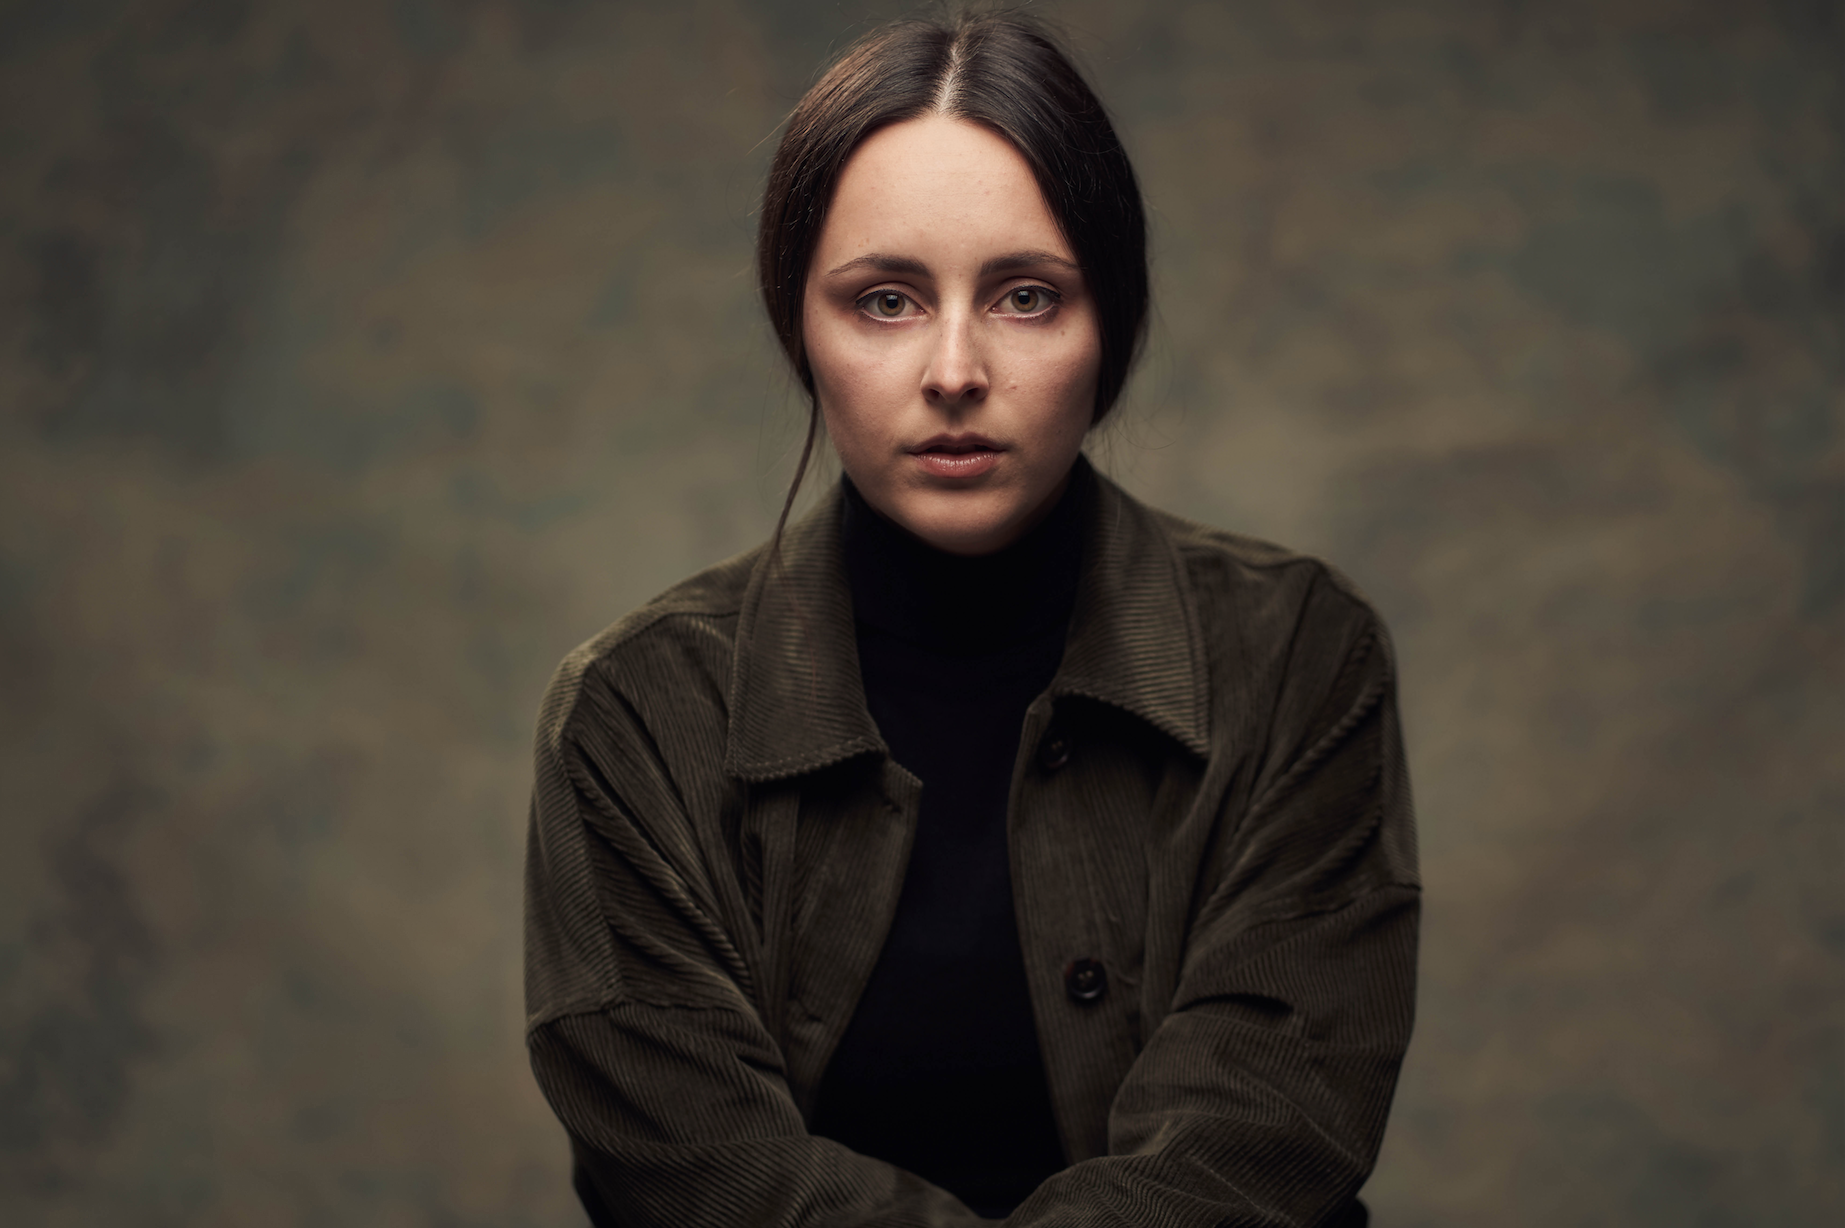 Director Laura Roe